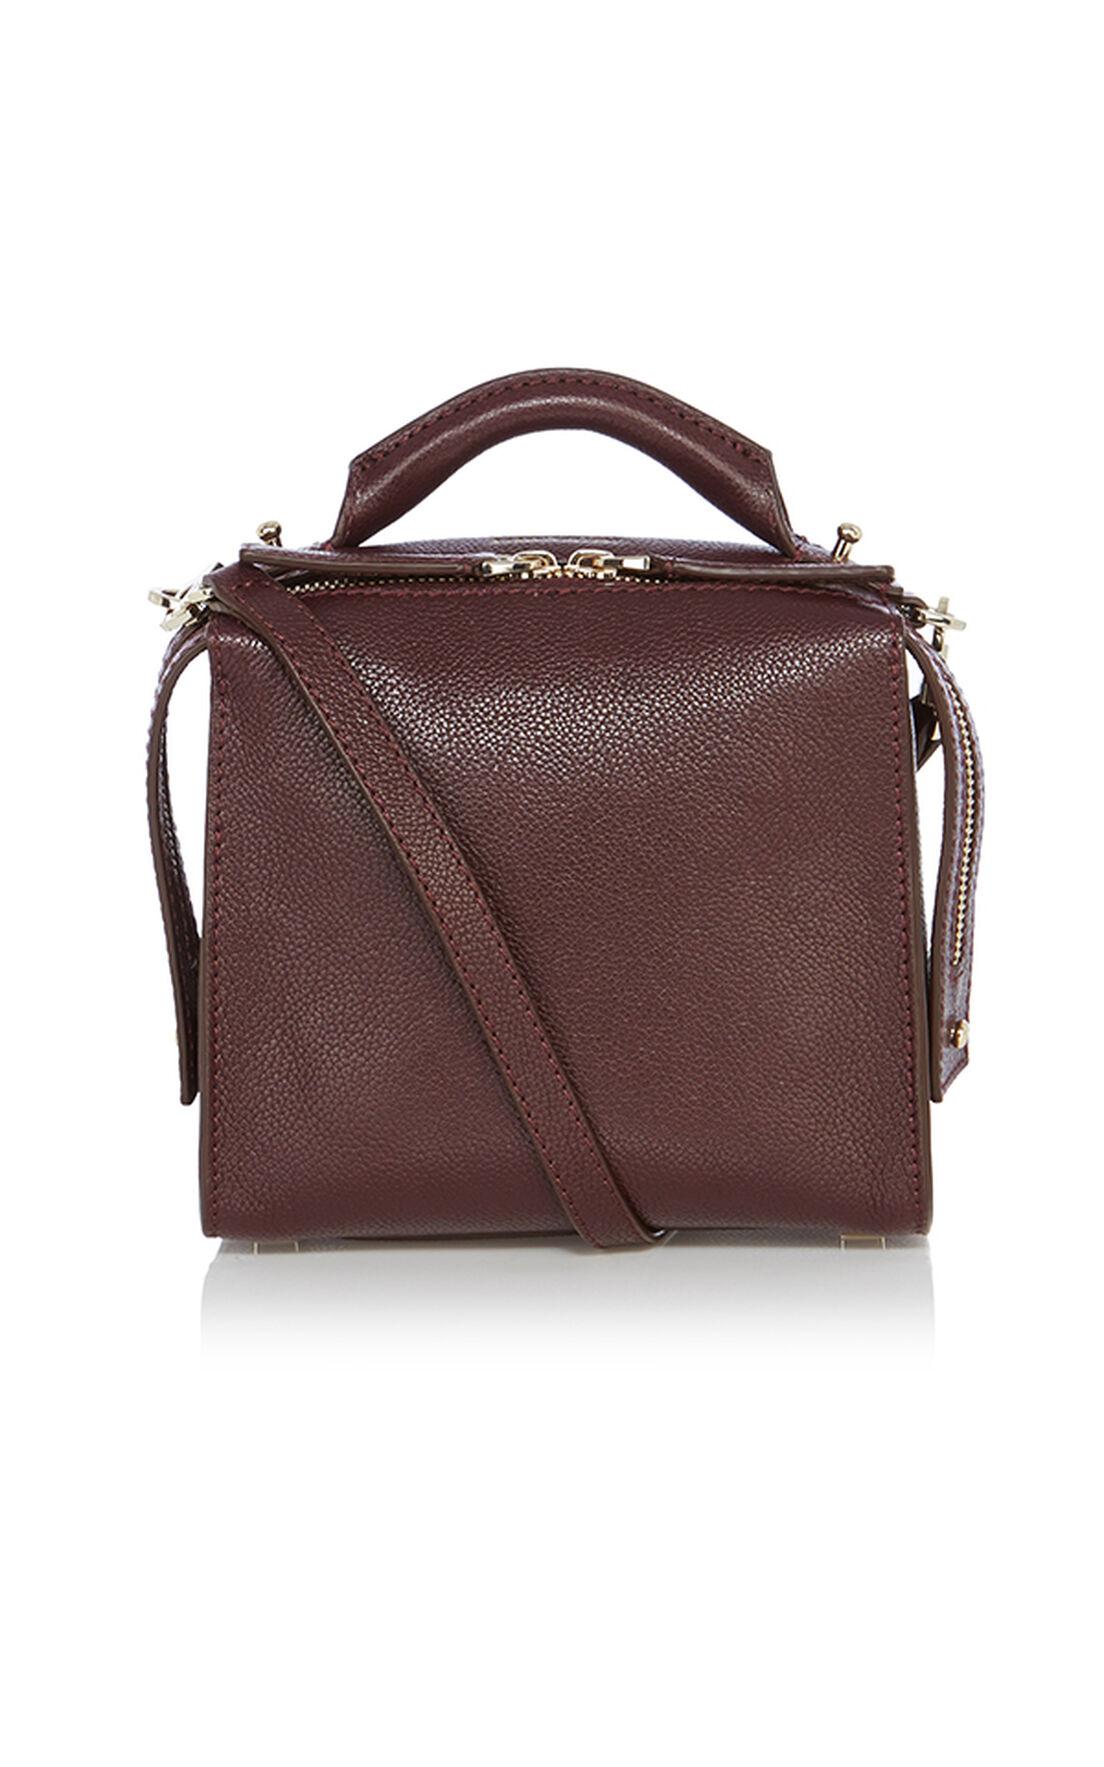 Karen Millen, Leather Box Bag Burgundy 0